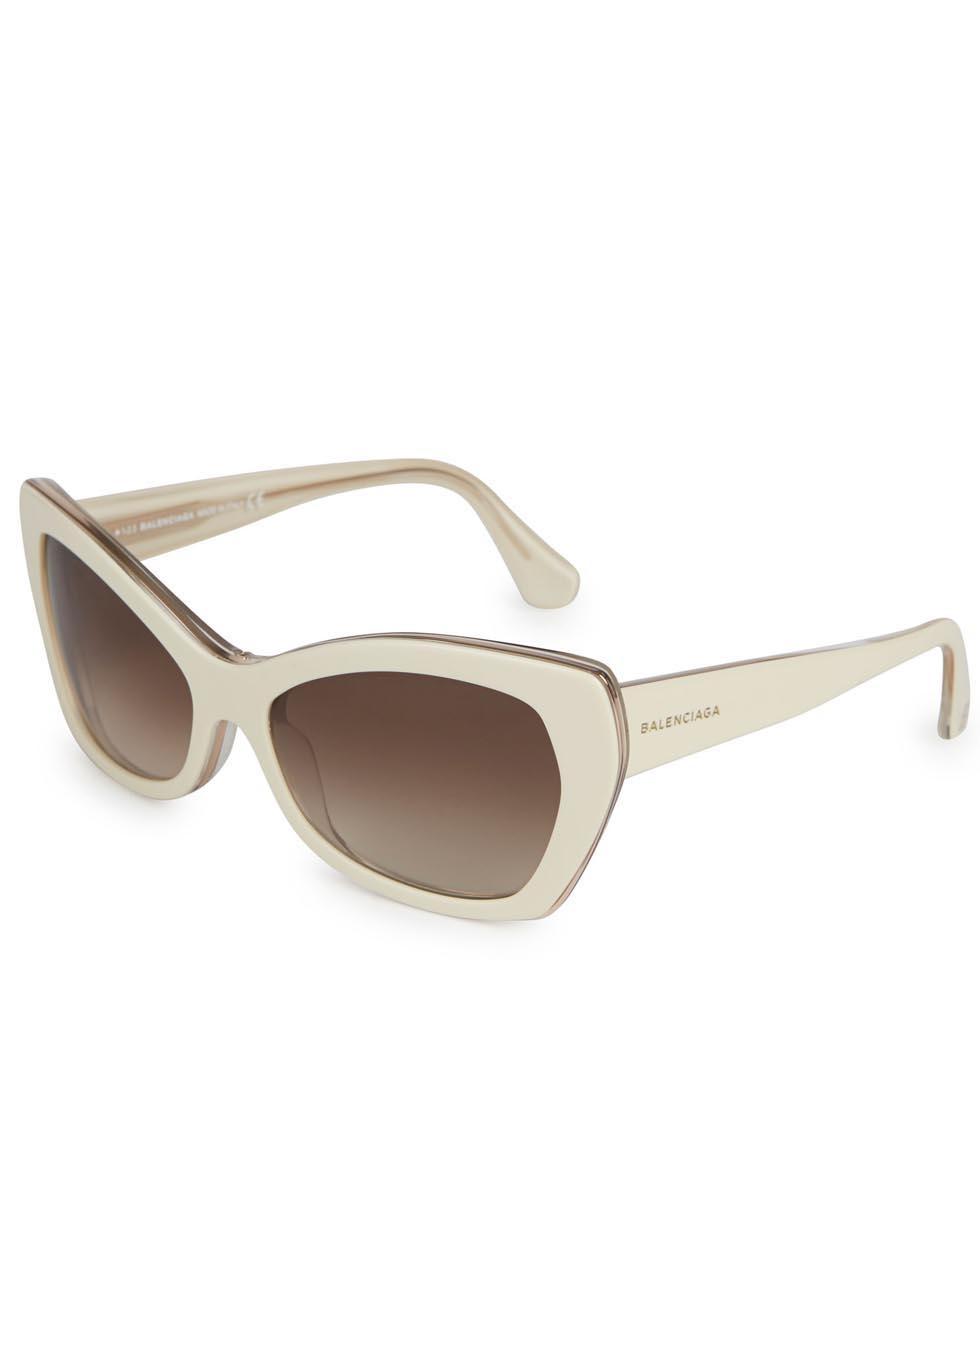 9ef5a52f46 Balenciaga Ivory Cateye Sunglasses in White - Lyst